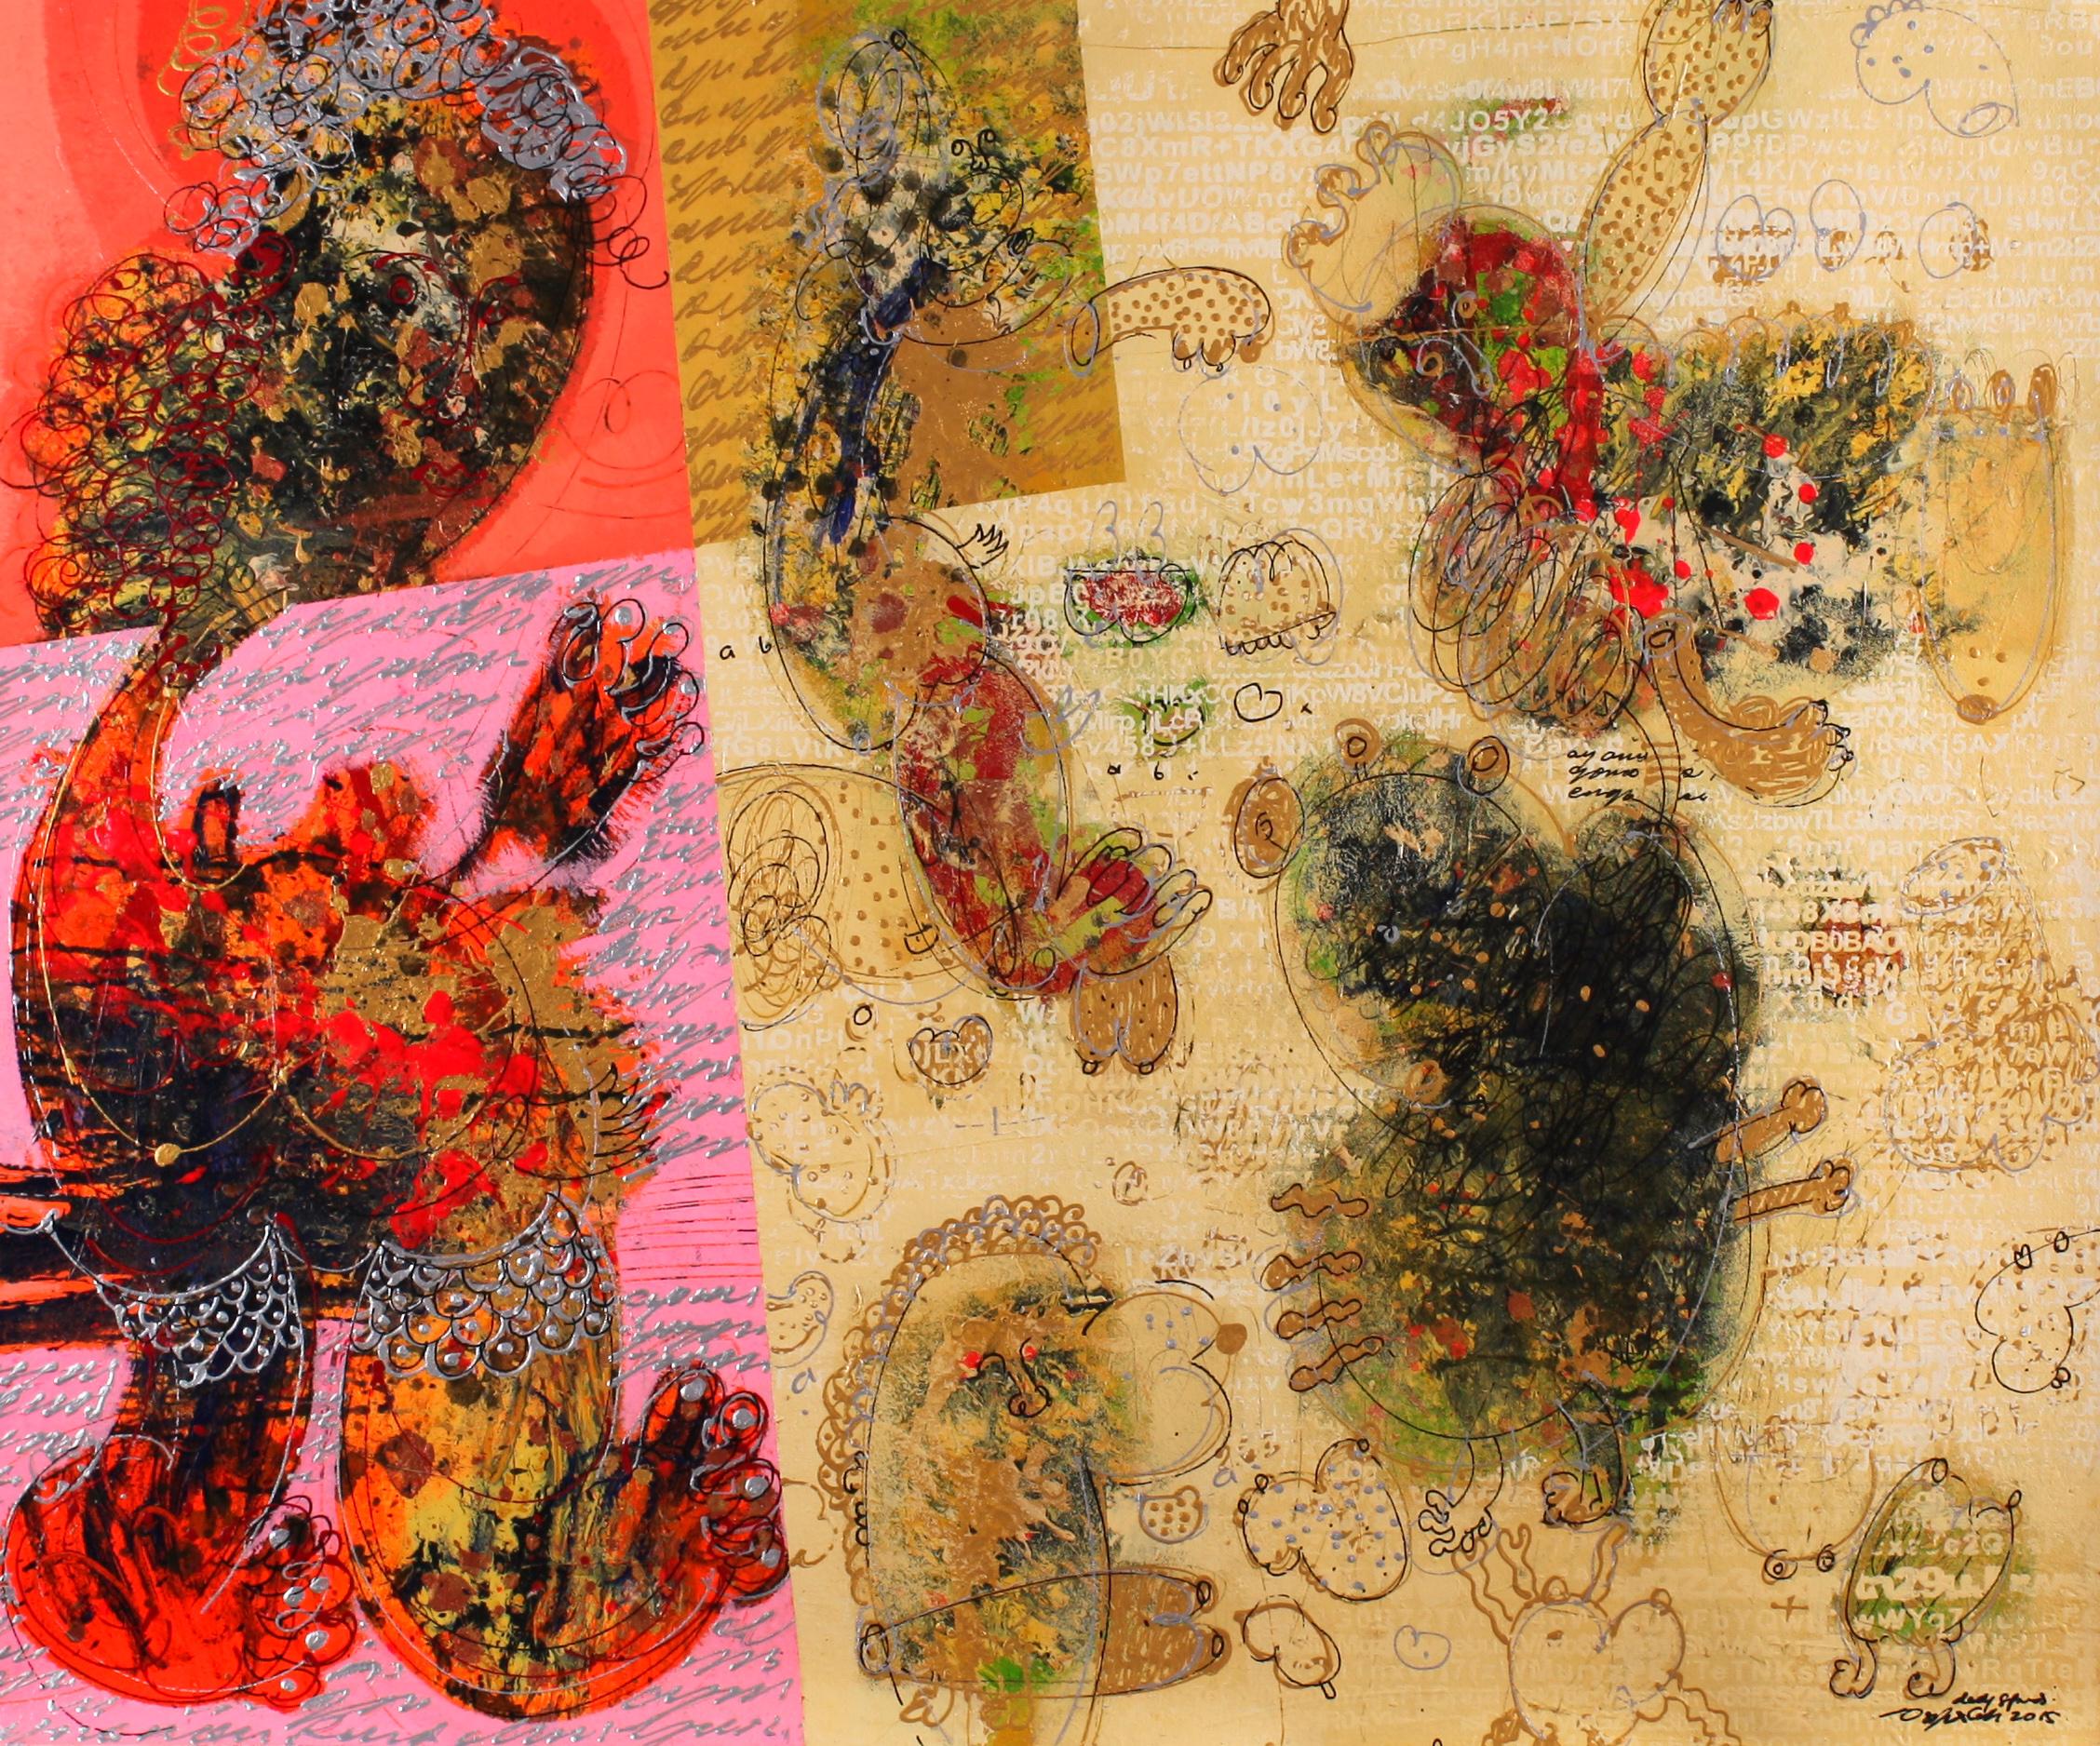 Dedy SUFRIADI,  Guernica  , 2015, Mixed media on canvas, 100 x 120 cm